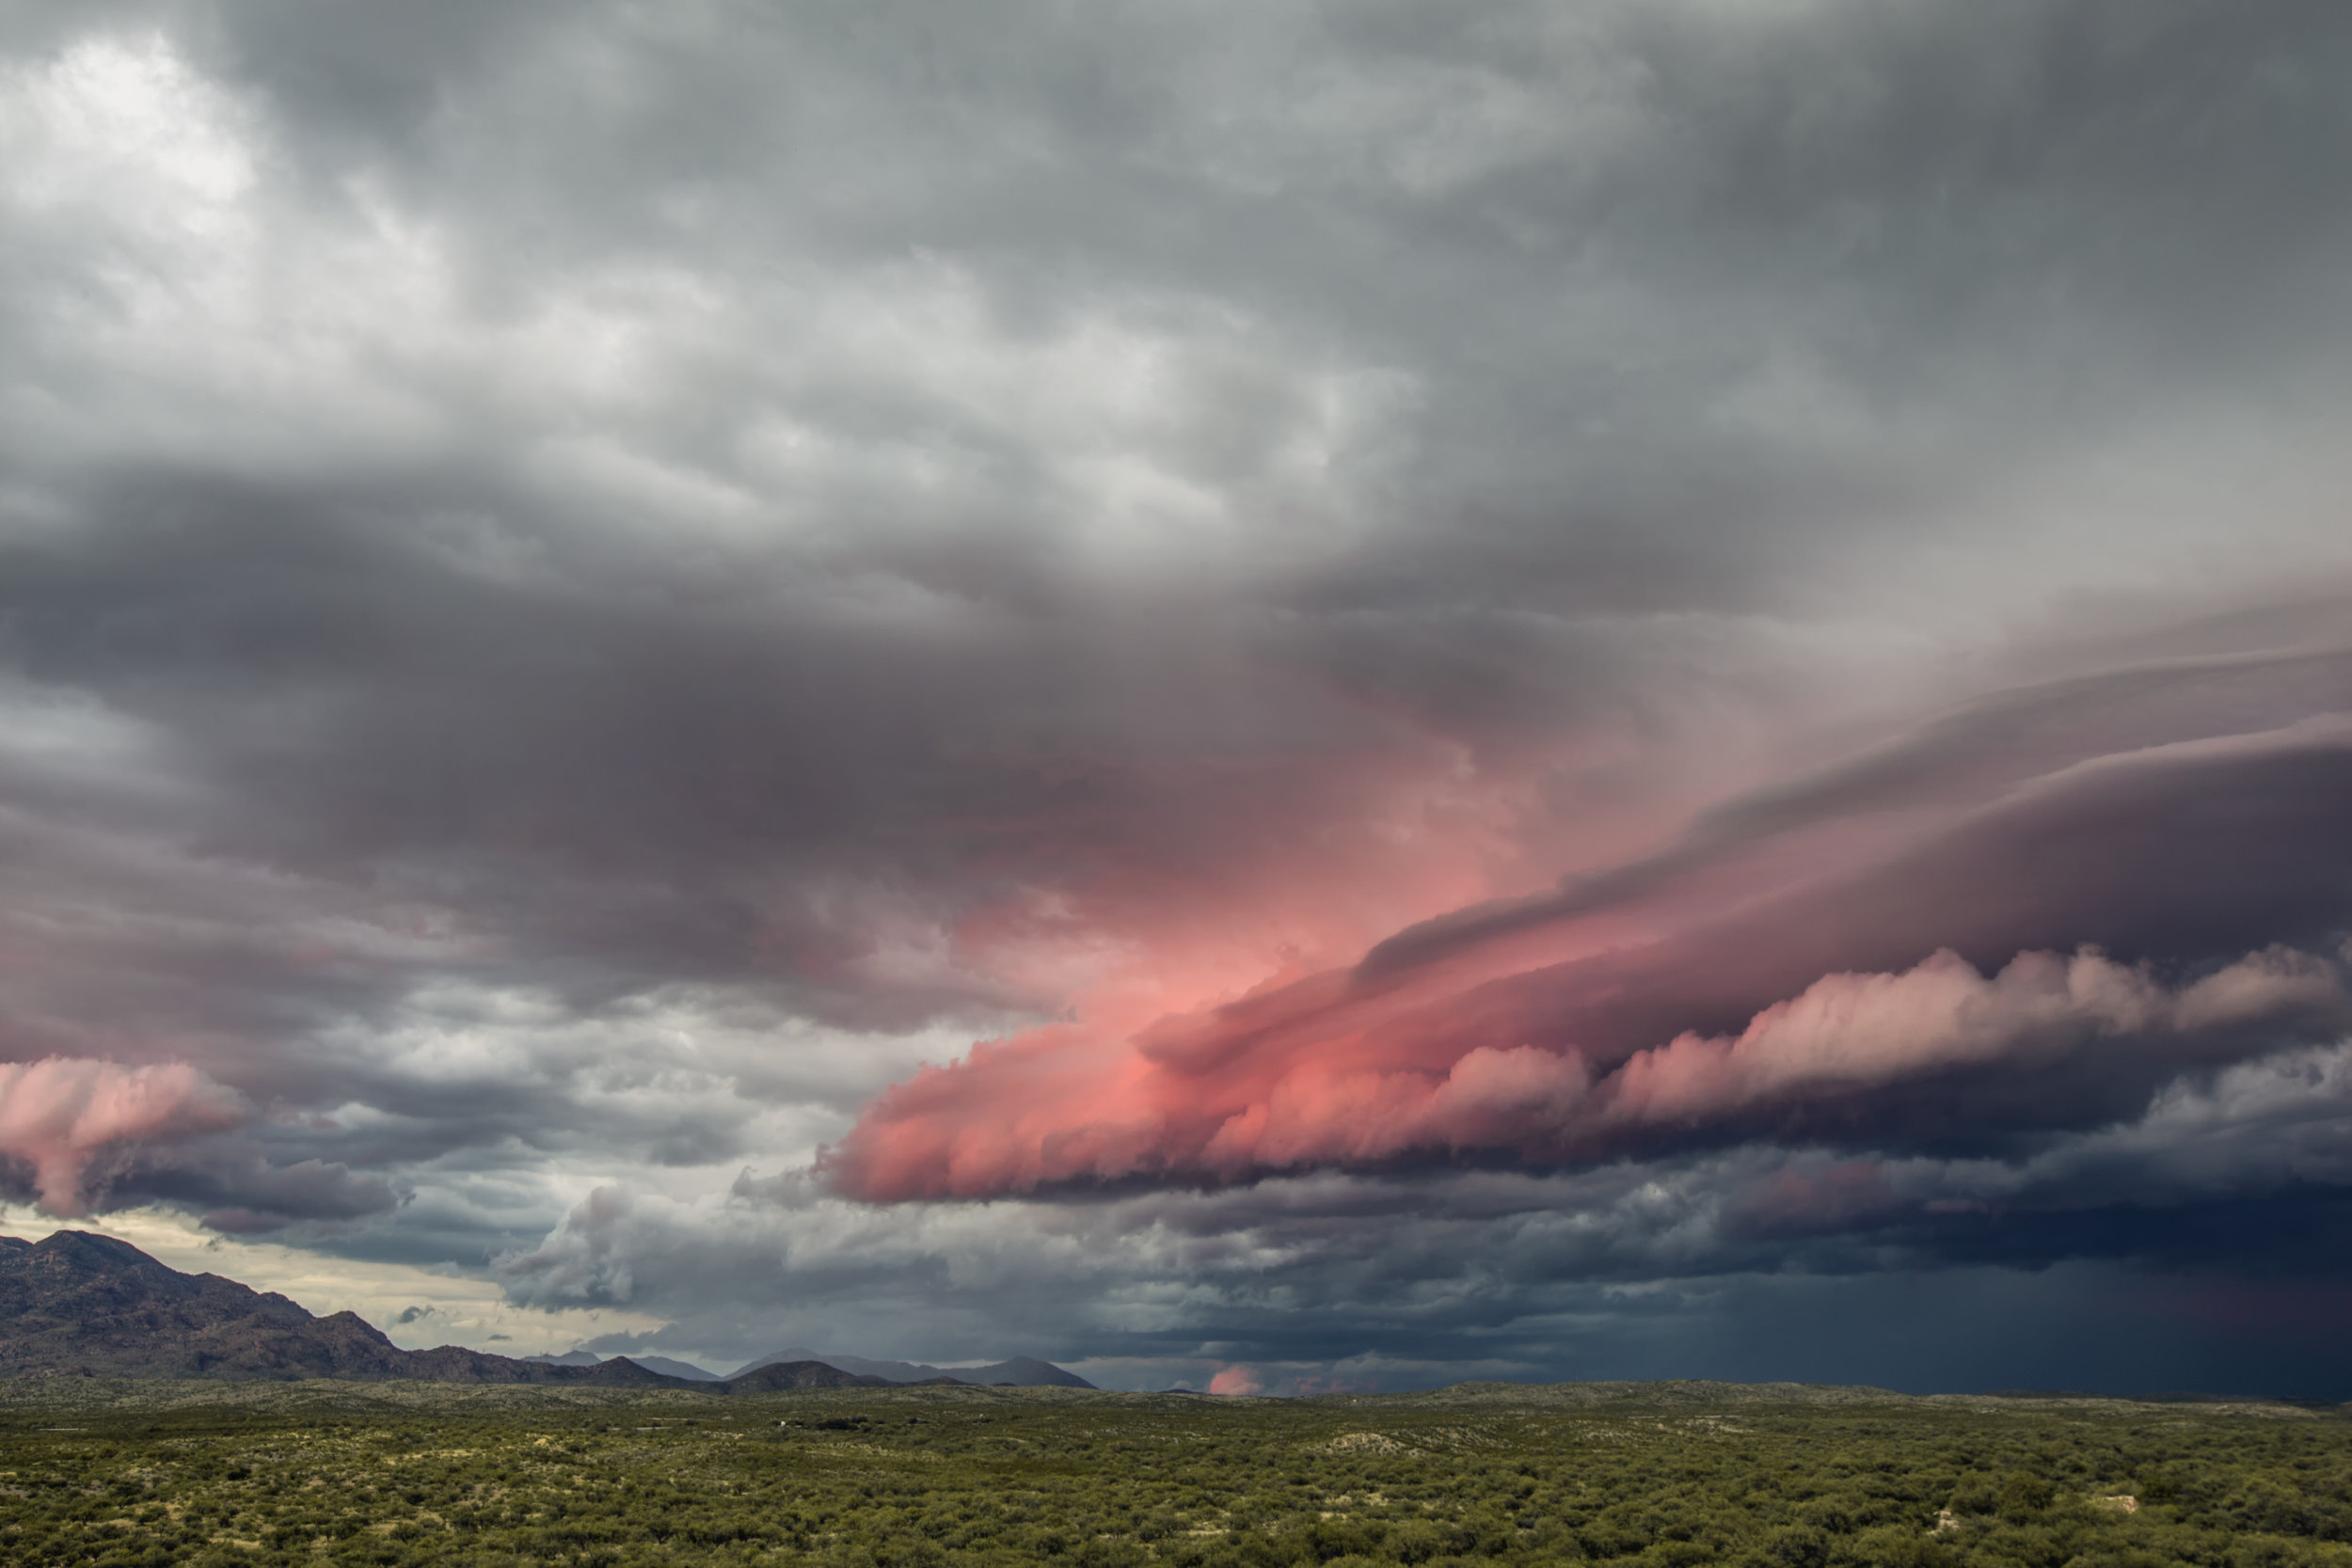 monsoon storm chase chasing stormchasing tour adventure workshop arizona 2018